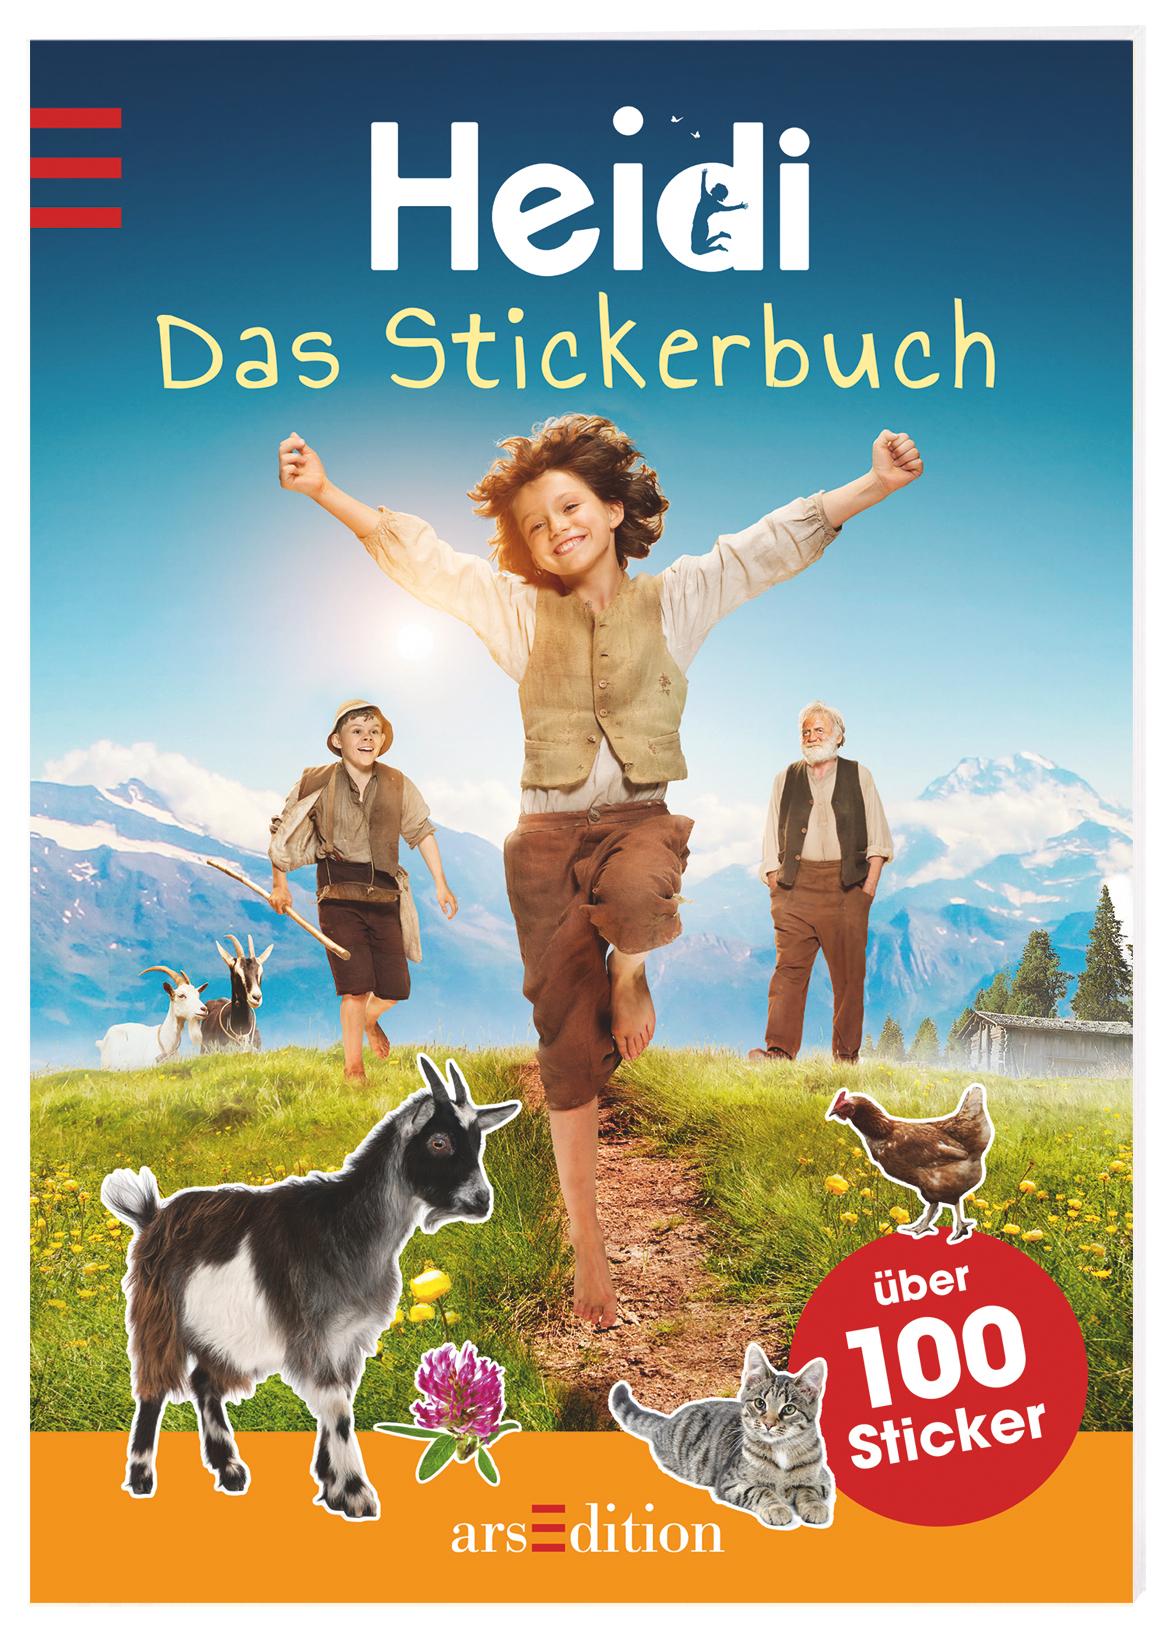 Heidi-Das-Stickerbuch